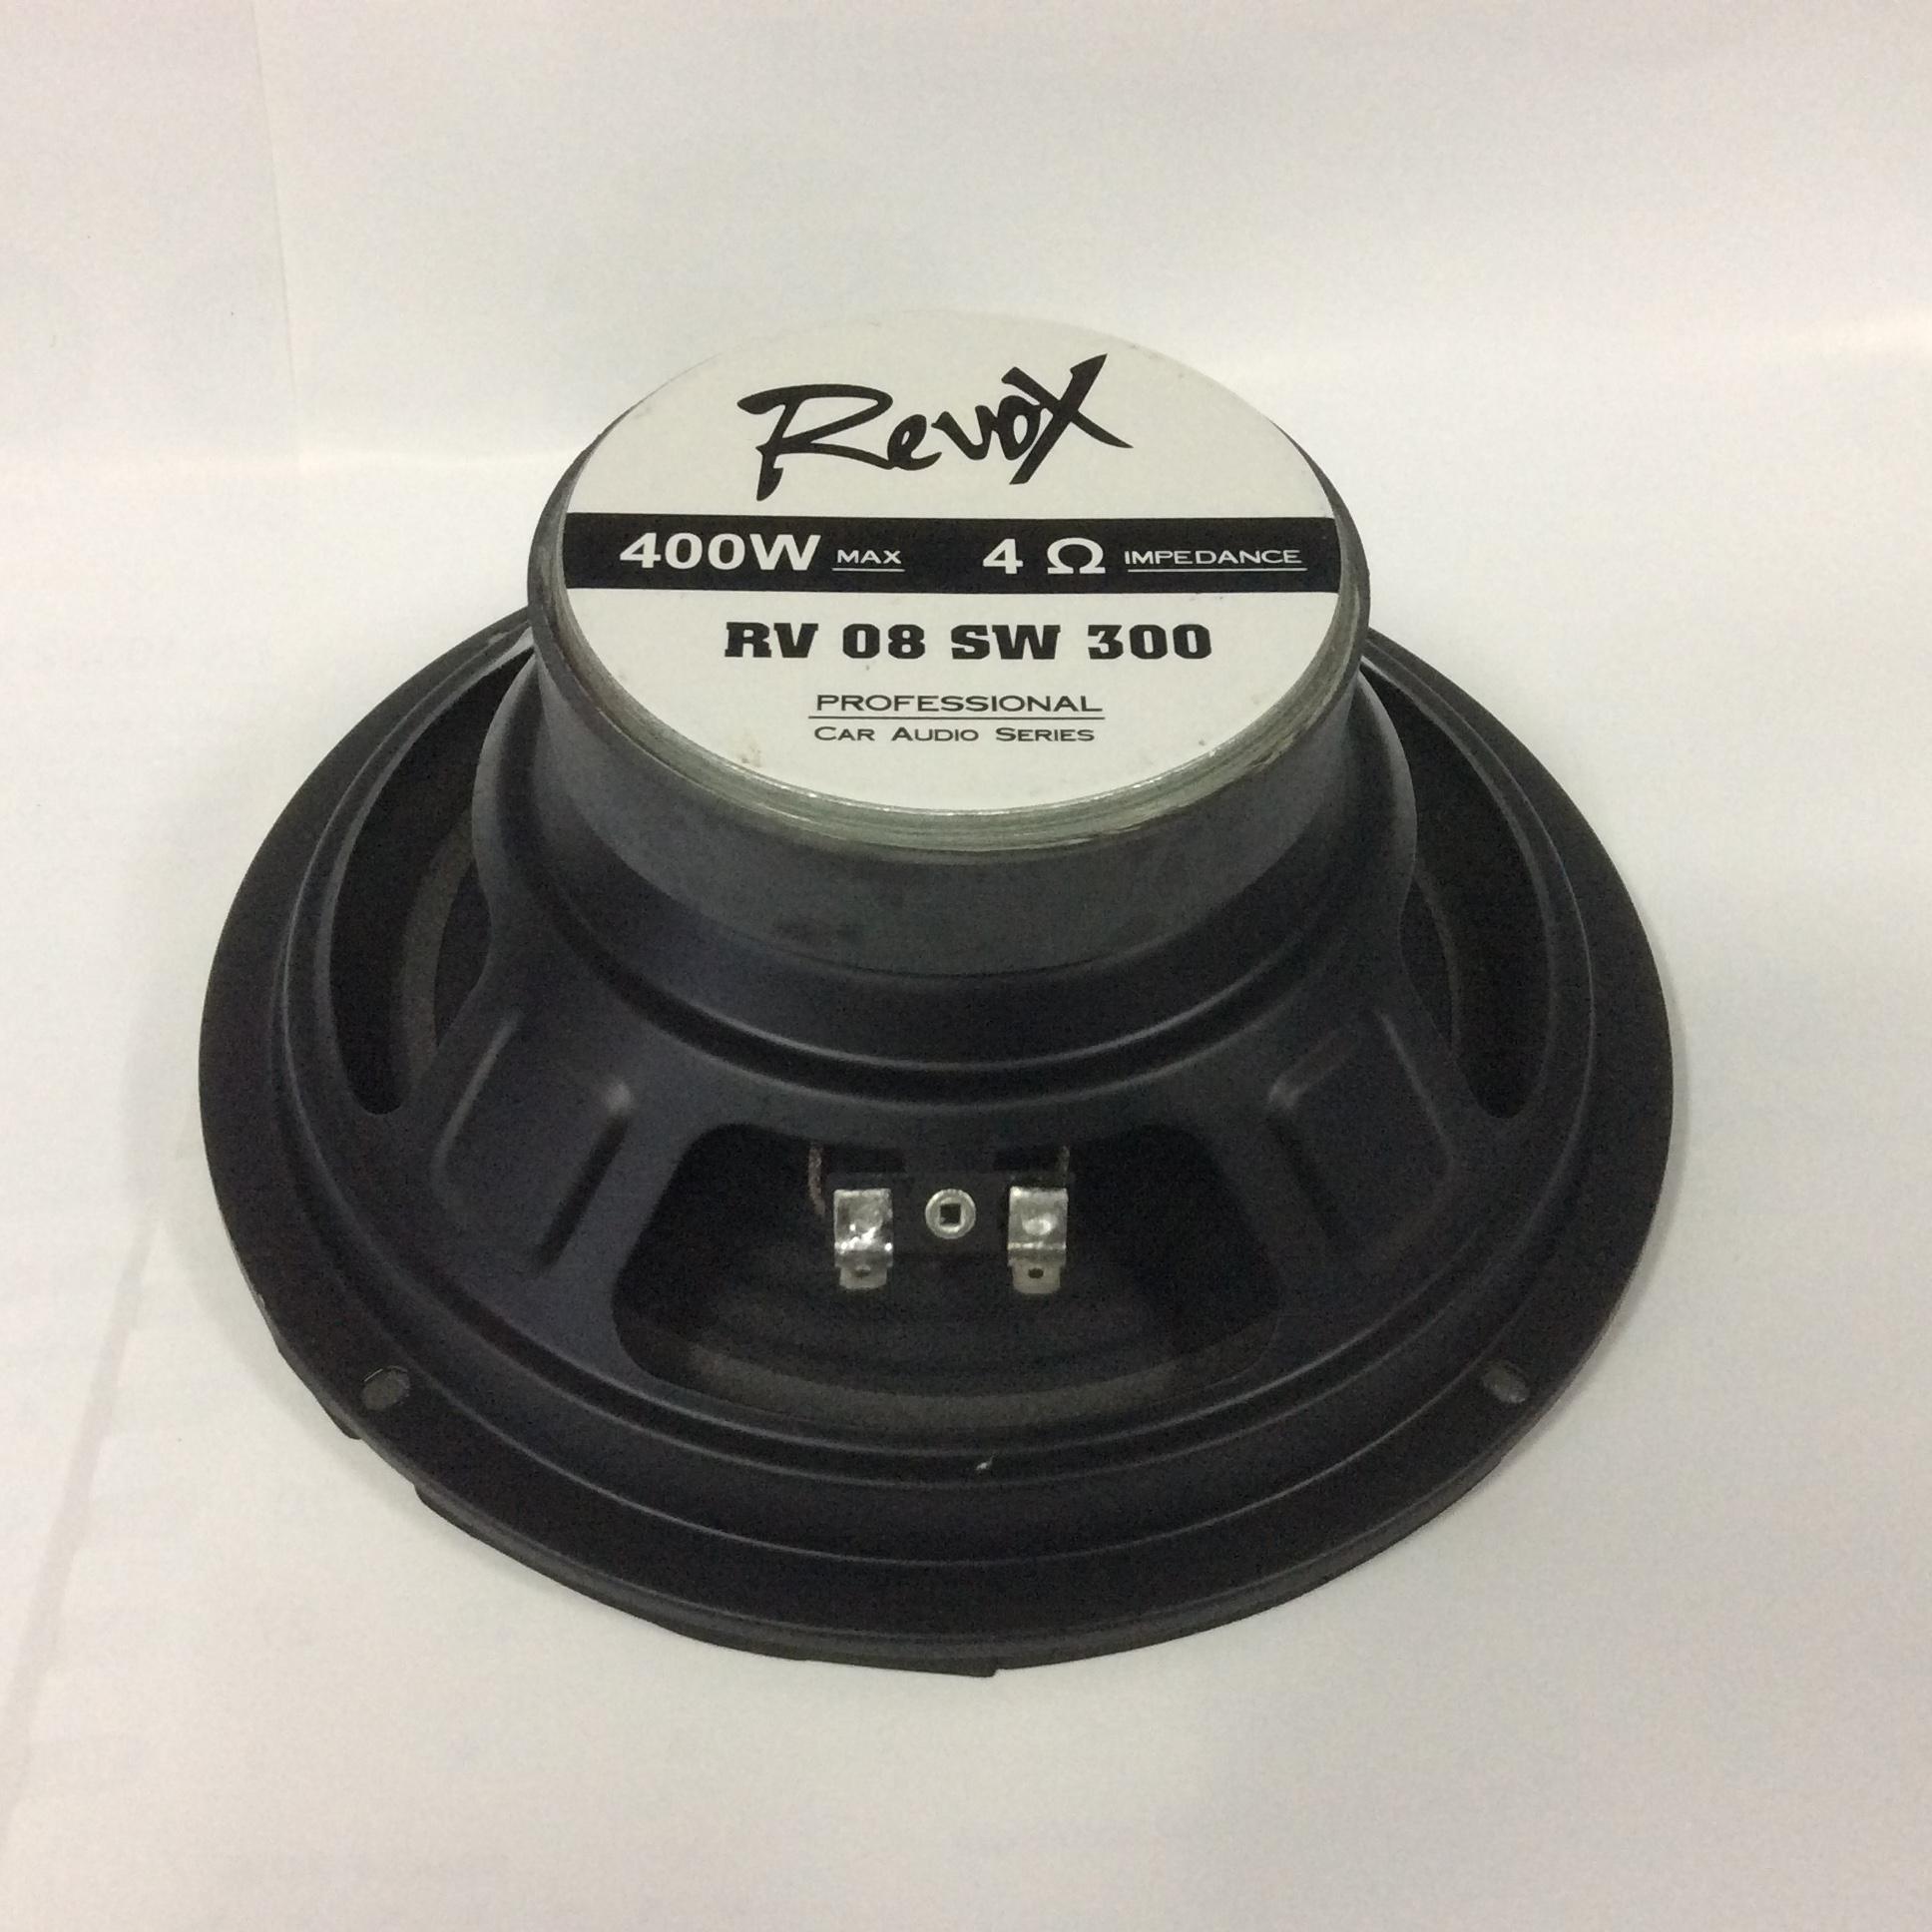 Subwofer 8 inch REVOX RV 08 SW 300. 4 ohm